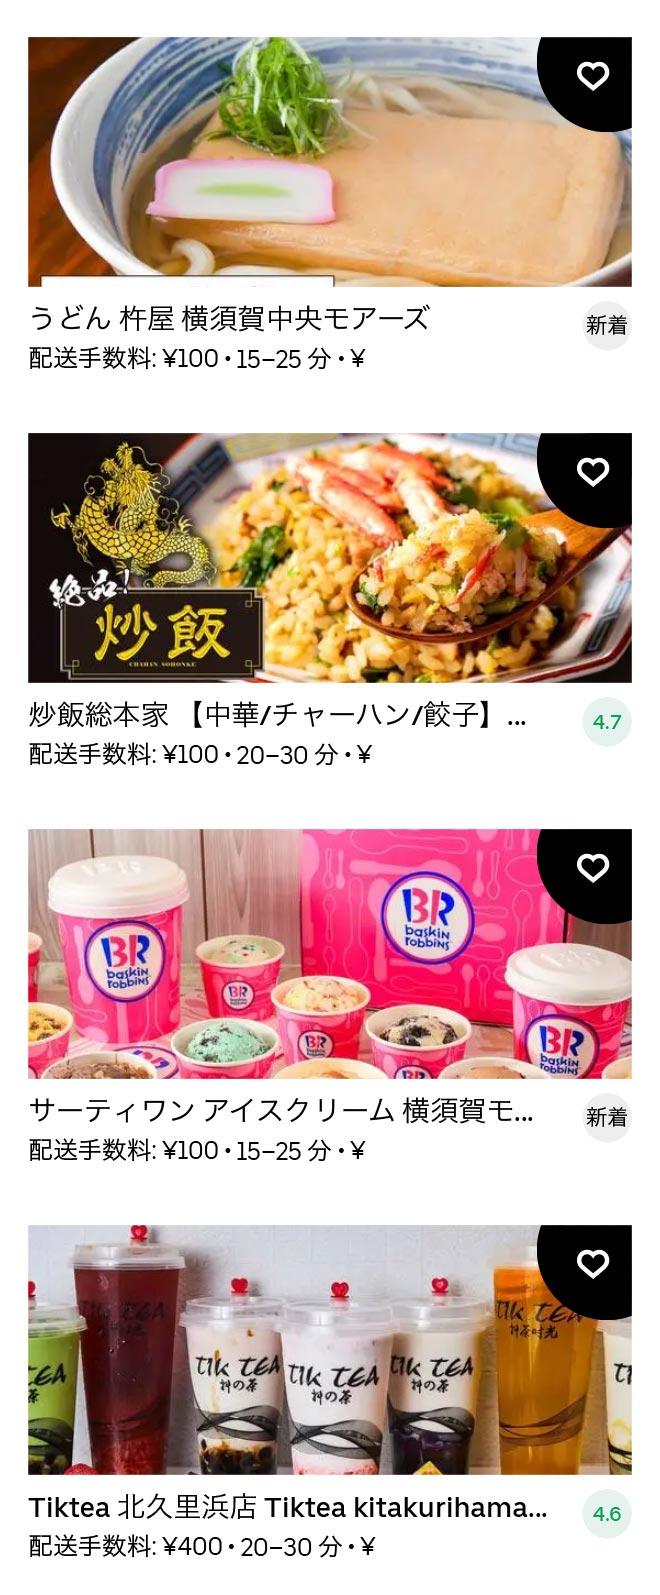 Yokosuka chuo menu 2011 06